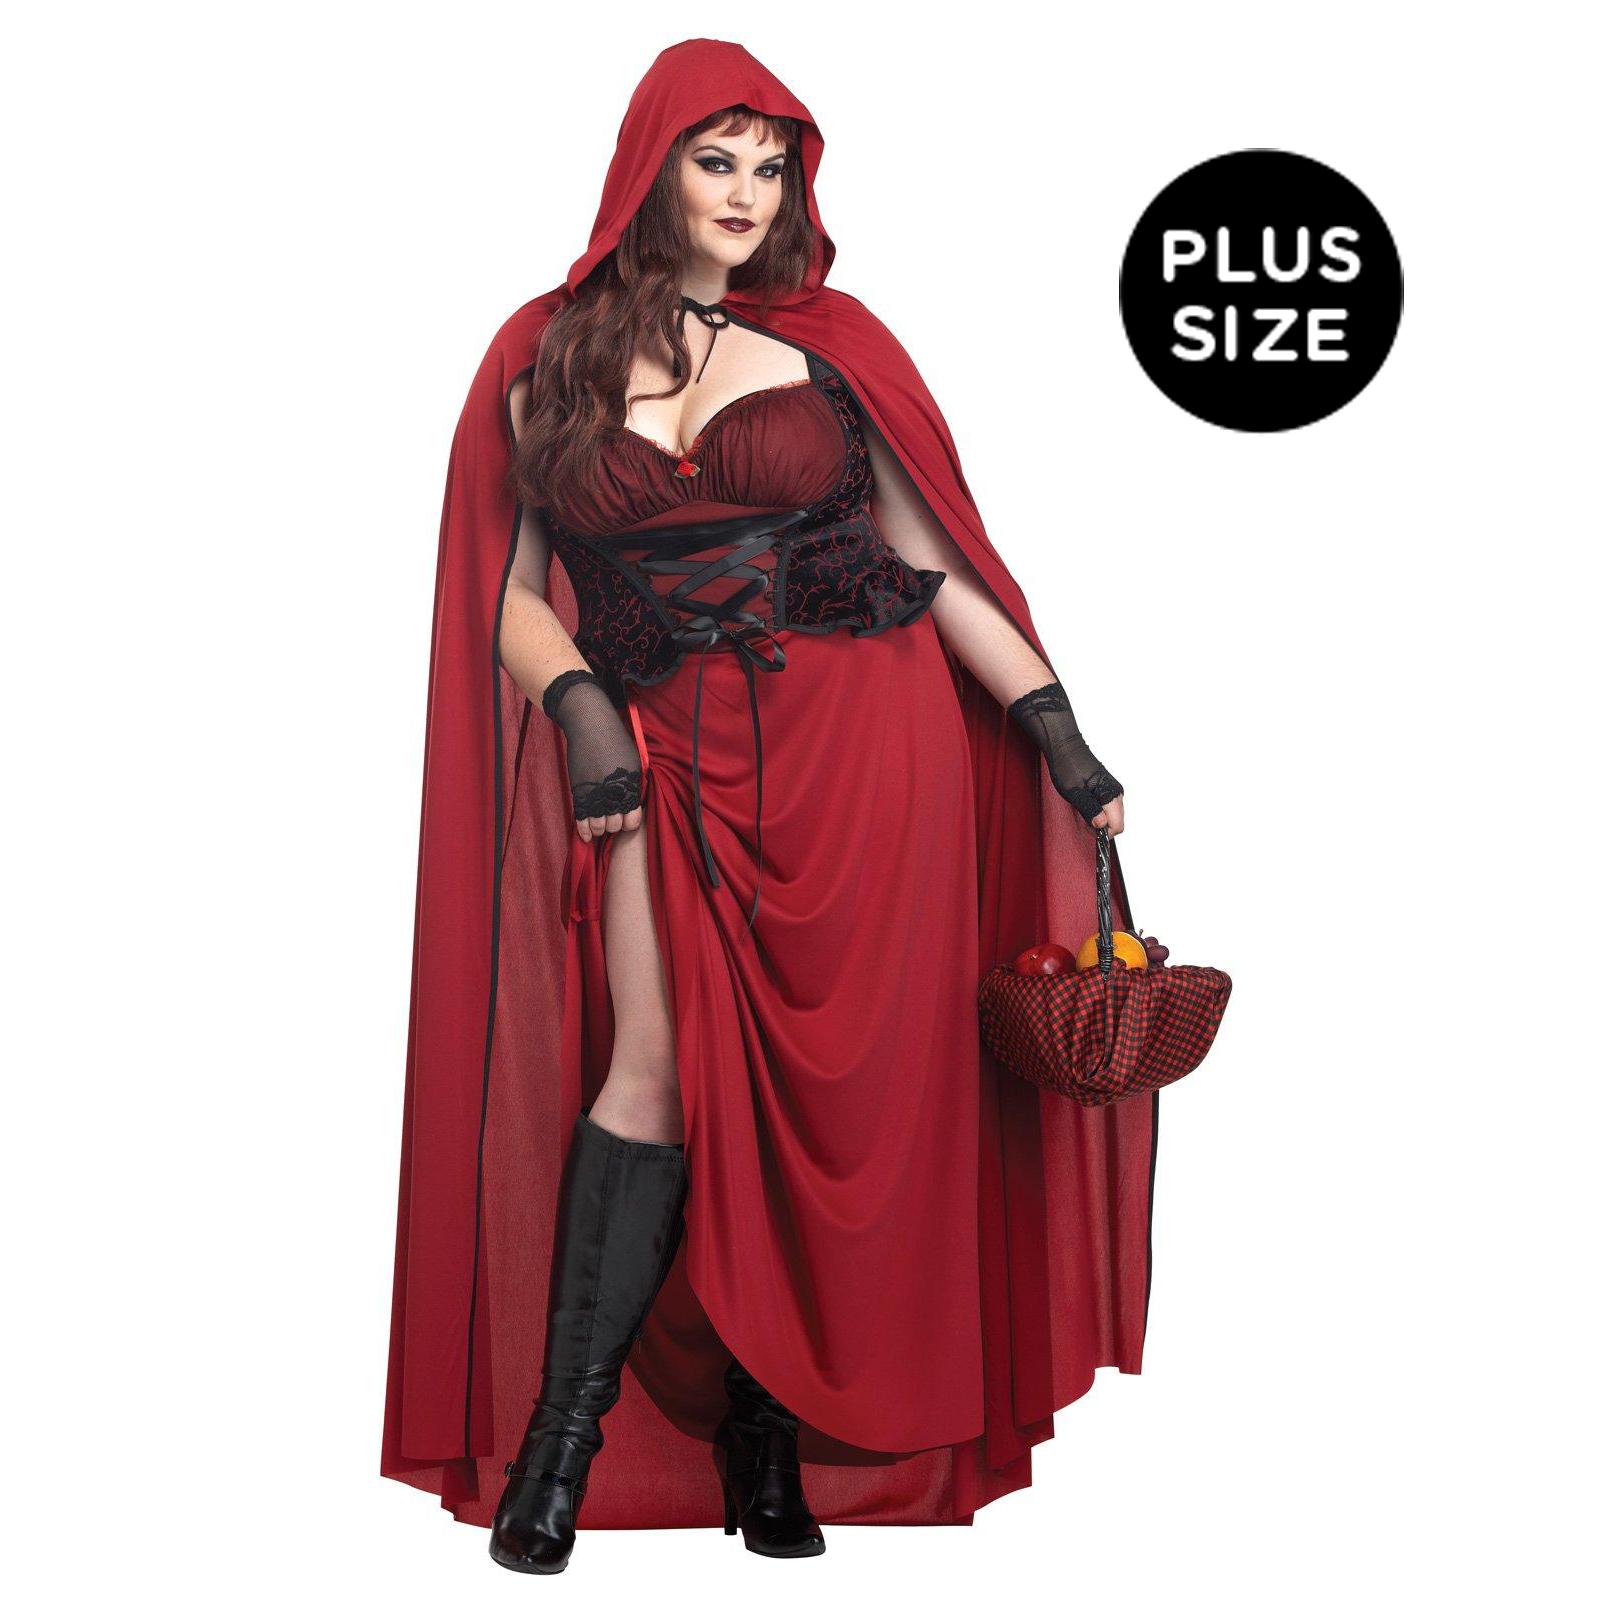 Dark Red Riding Hood Plus Size Costume | BuyCostumes.com